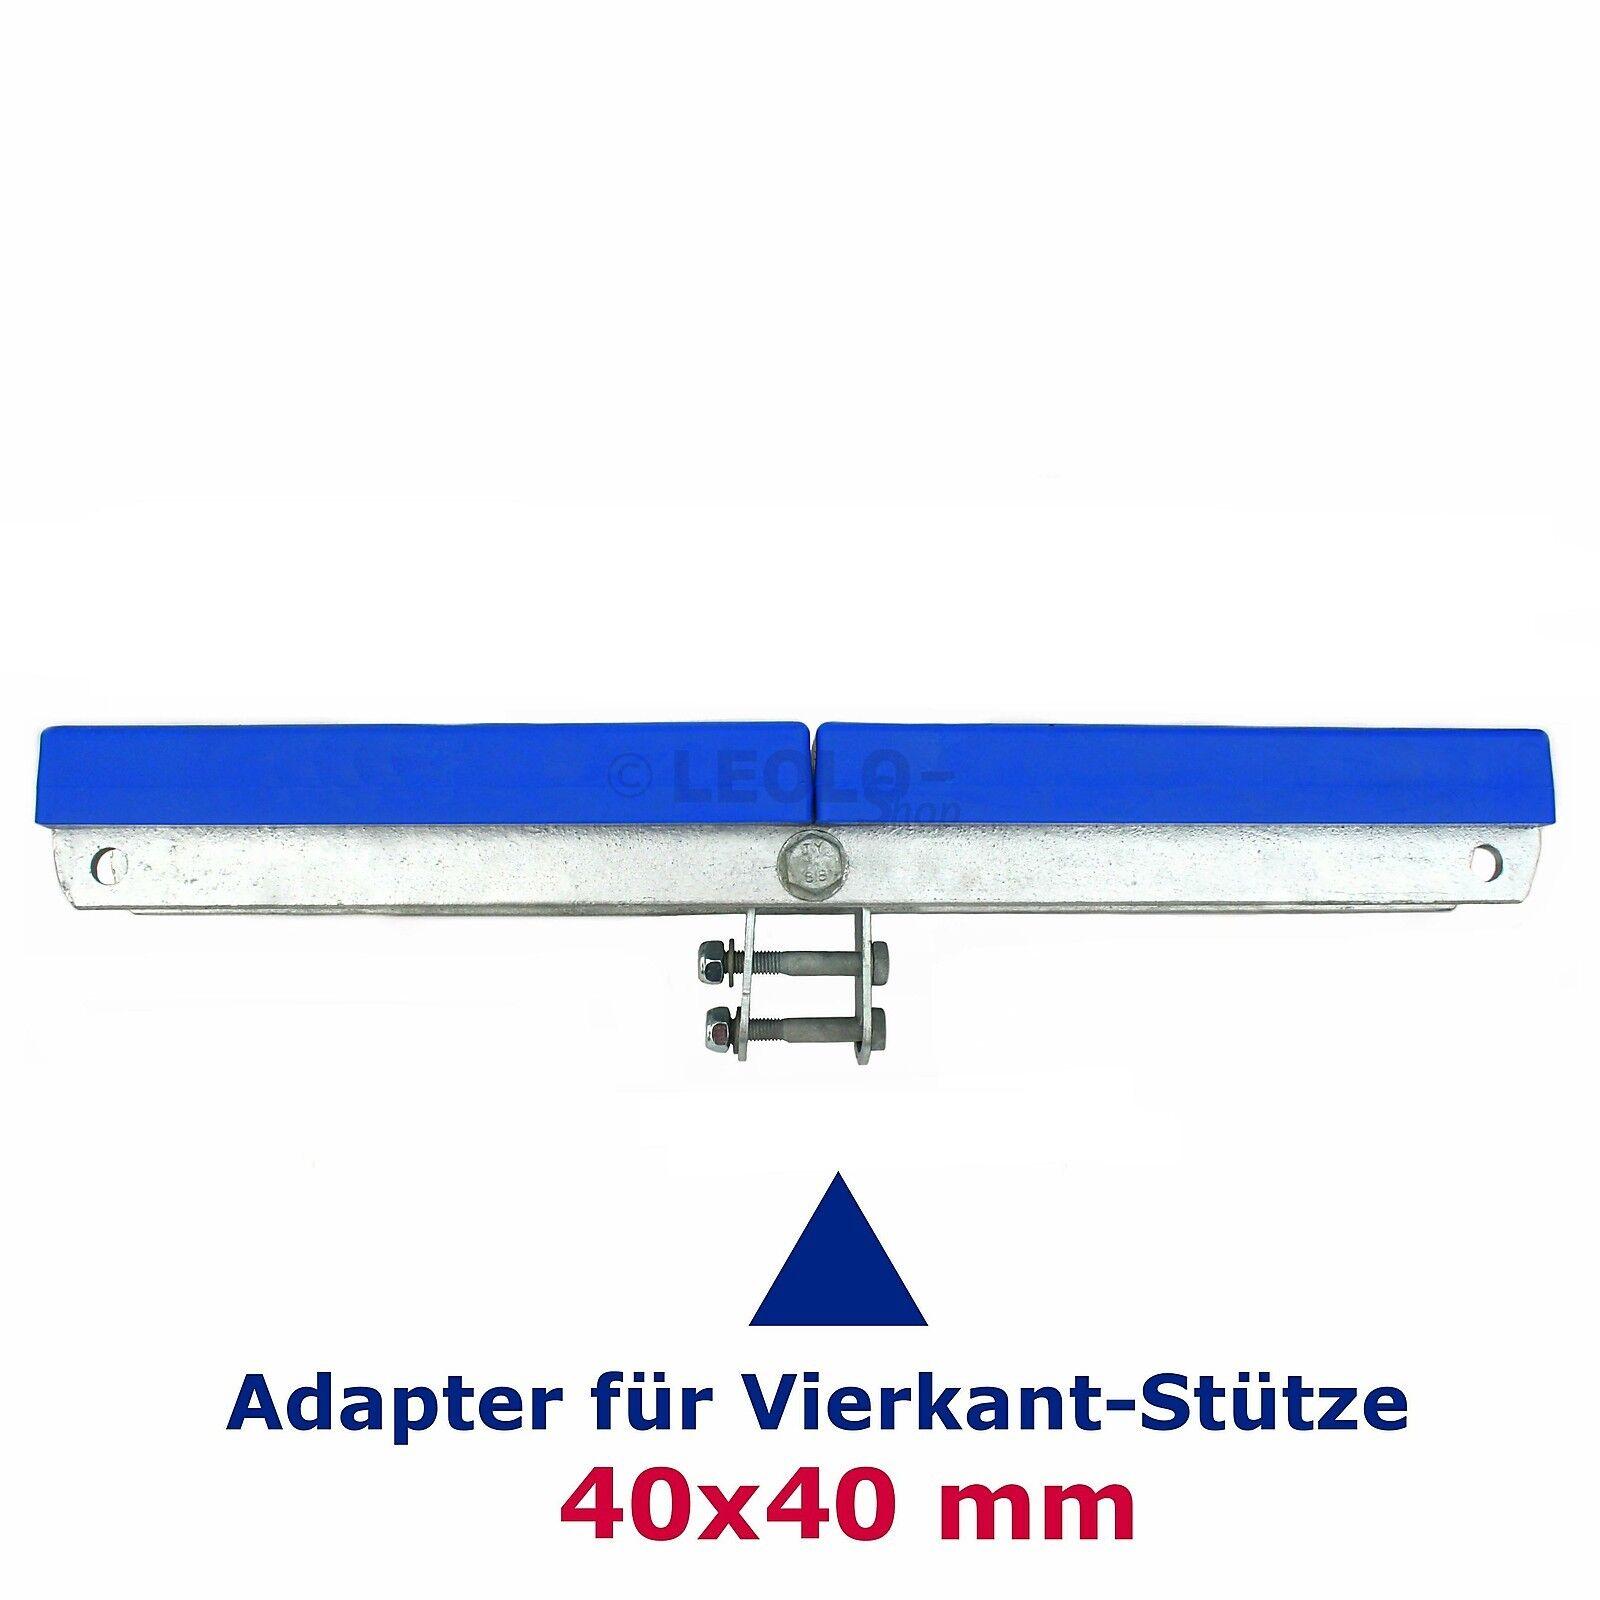 ⚓ Stiefelauflage  600 mm blau inkl. Montage-Kit ➔ spurfrei  Stiefelauflage | Sliphilfe 90a670